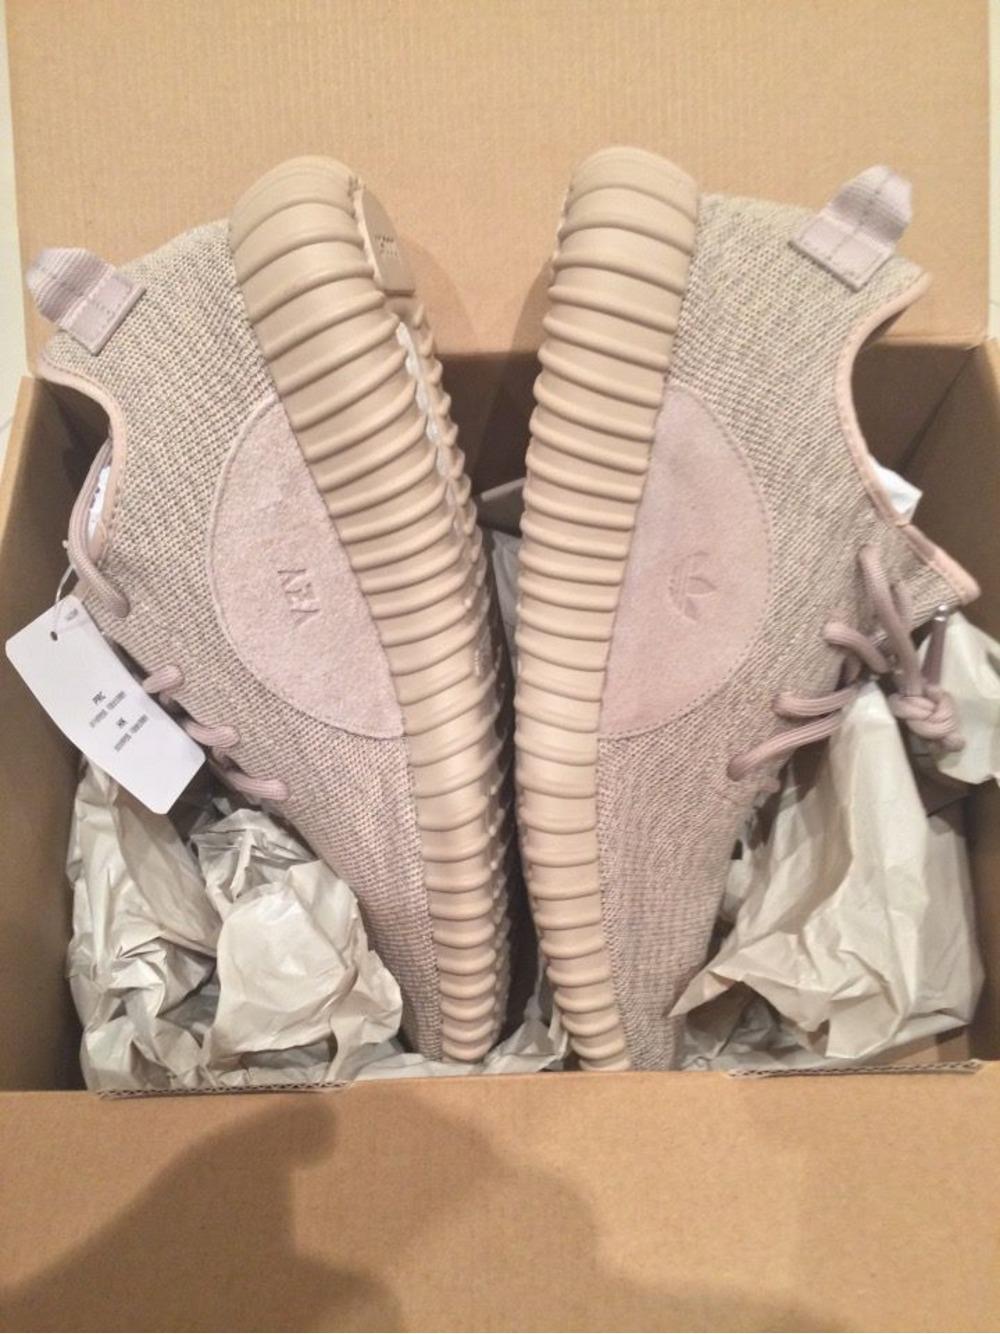 Adidas Yeezy boost 350 Oxford Tan US 9.5 BOX FRESH ...